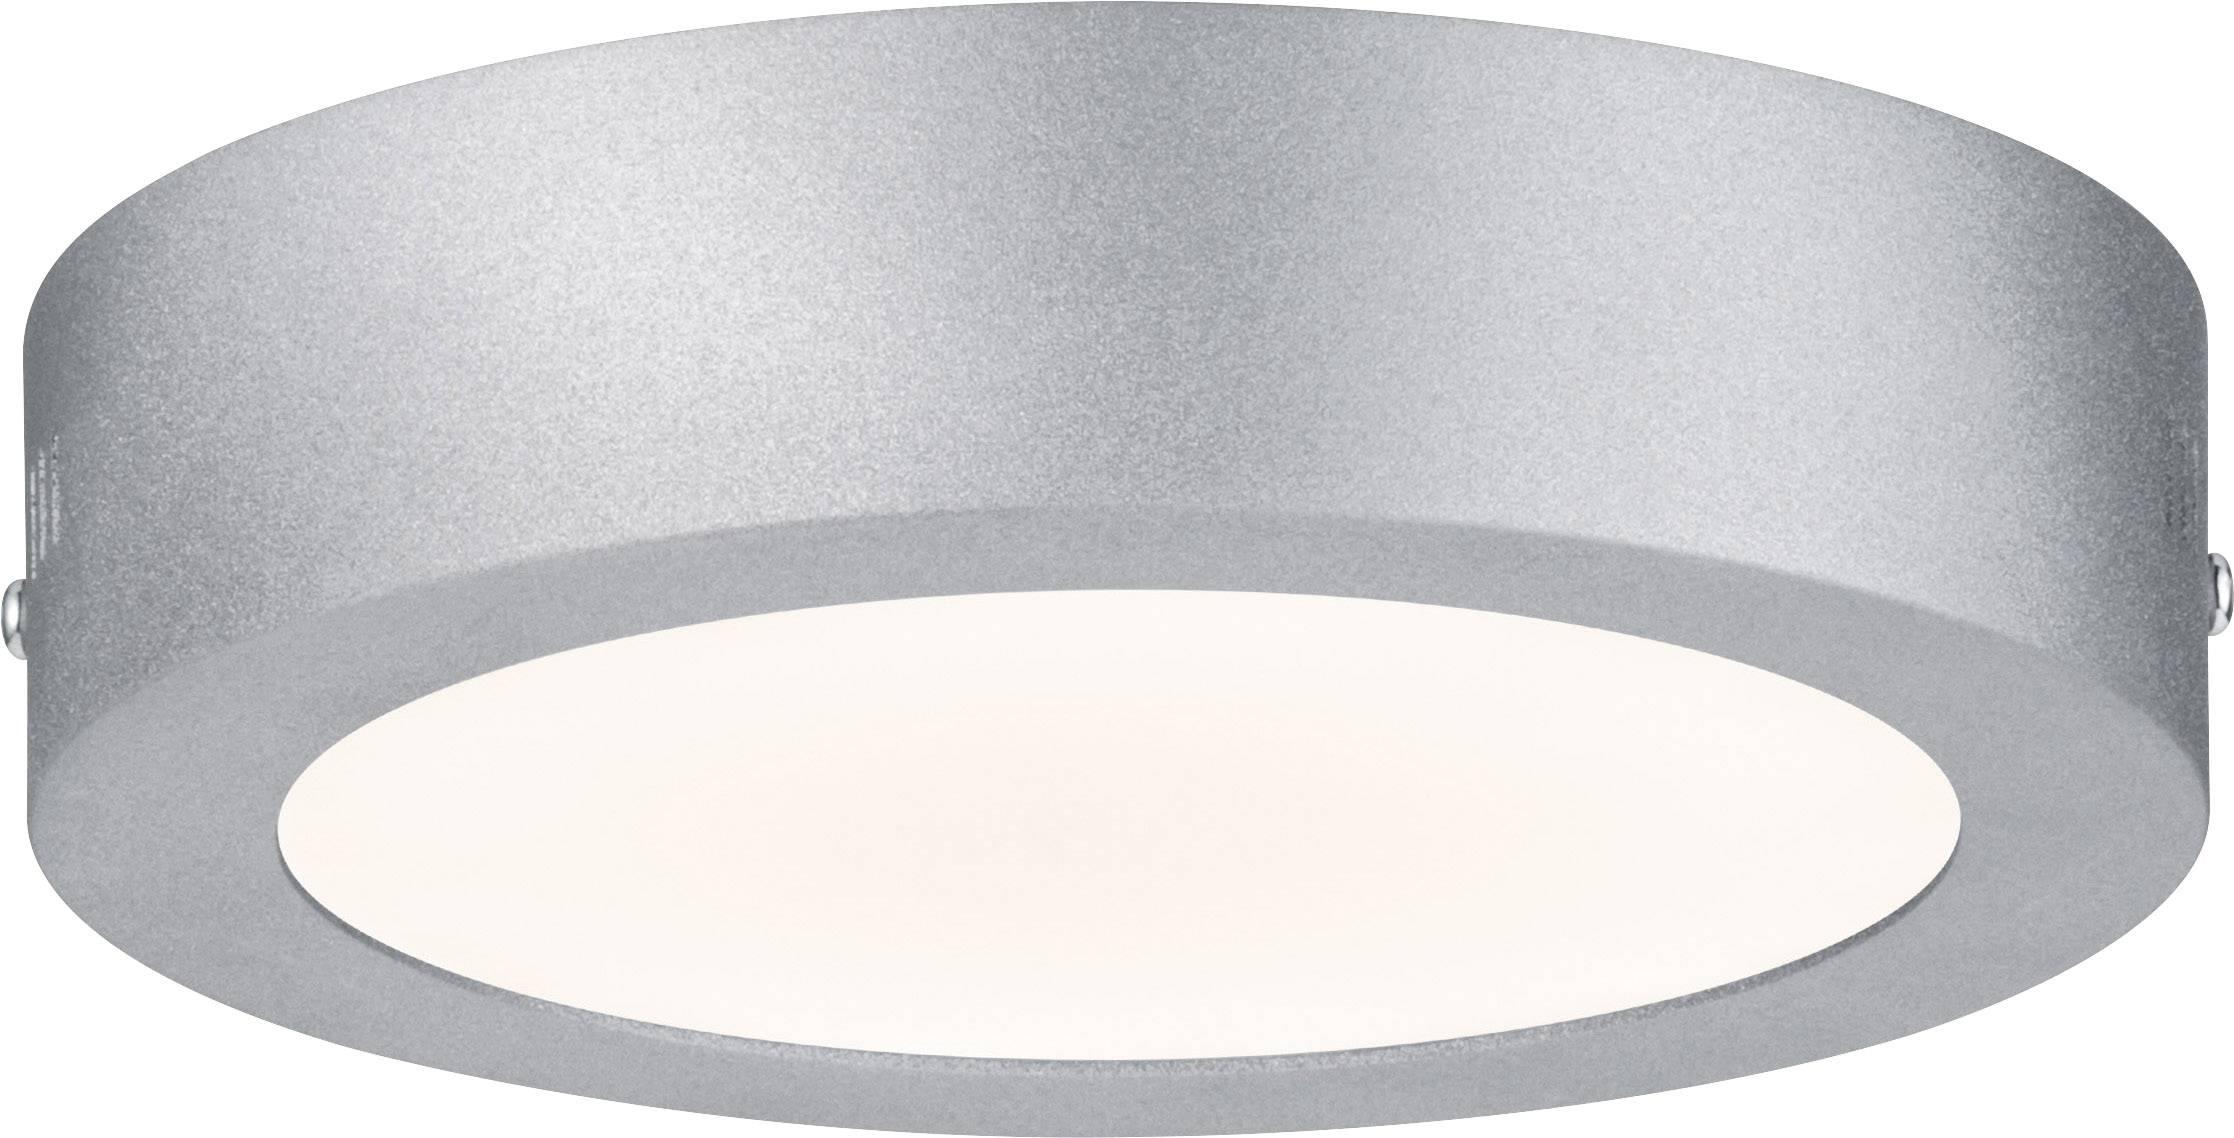 Pannello LED Classe energetica